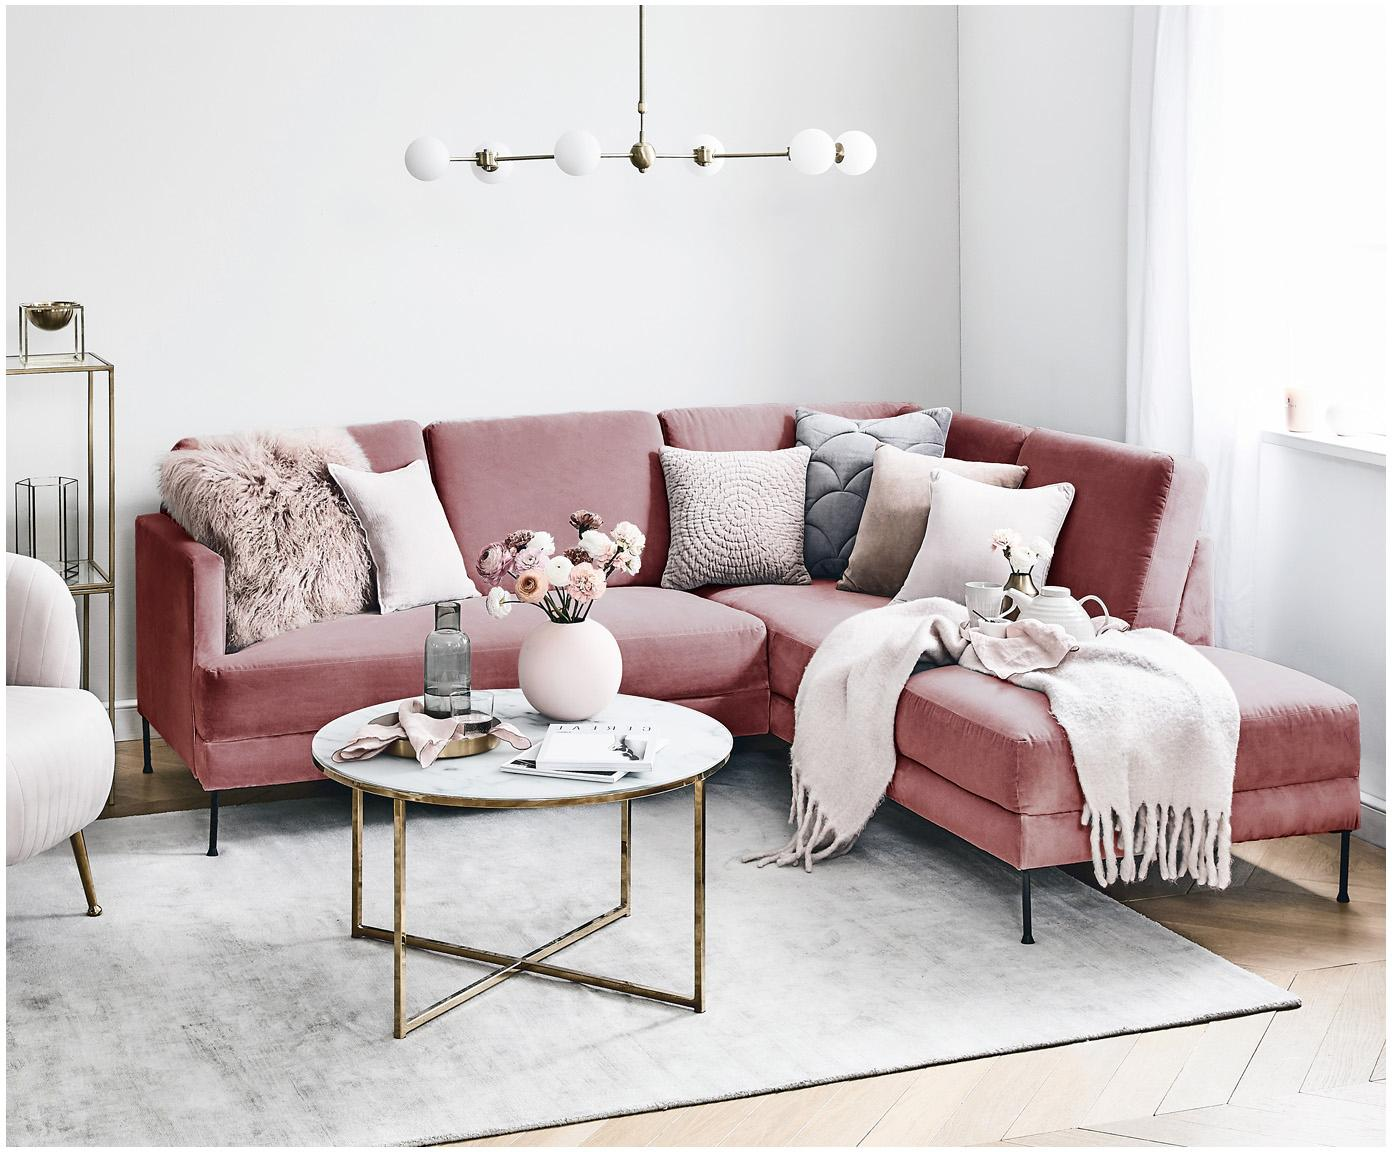 Fluwelen hoekbank Fluente, Bekleding: fluweel (hoogwaardig poly, Frame: massief grenenhout, Poten: gelakt metaal, Roze, B 221 x D 200 cm